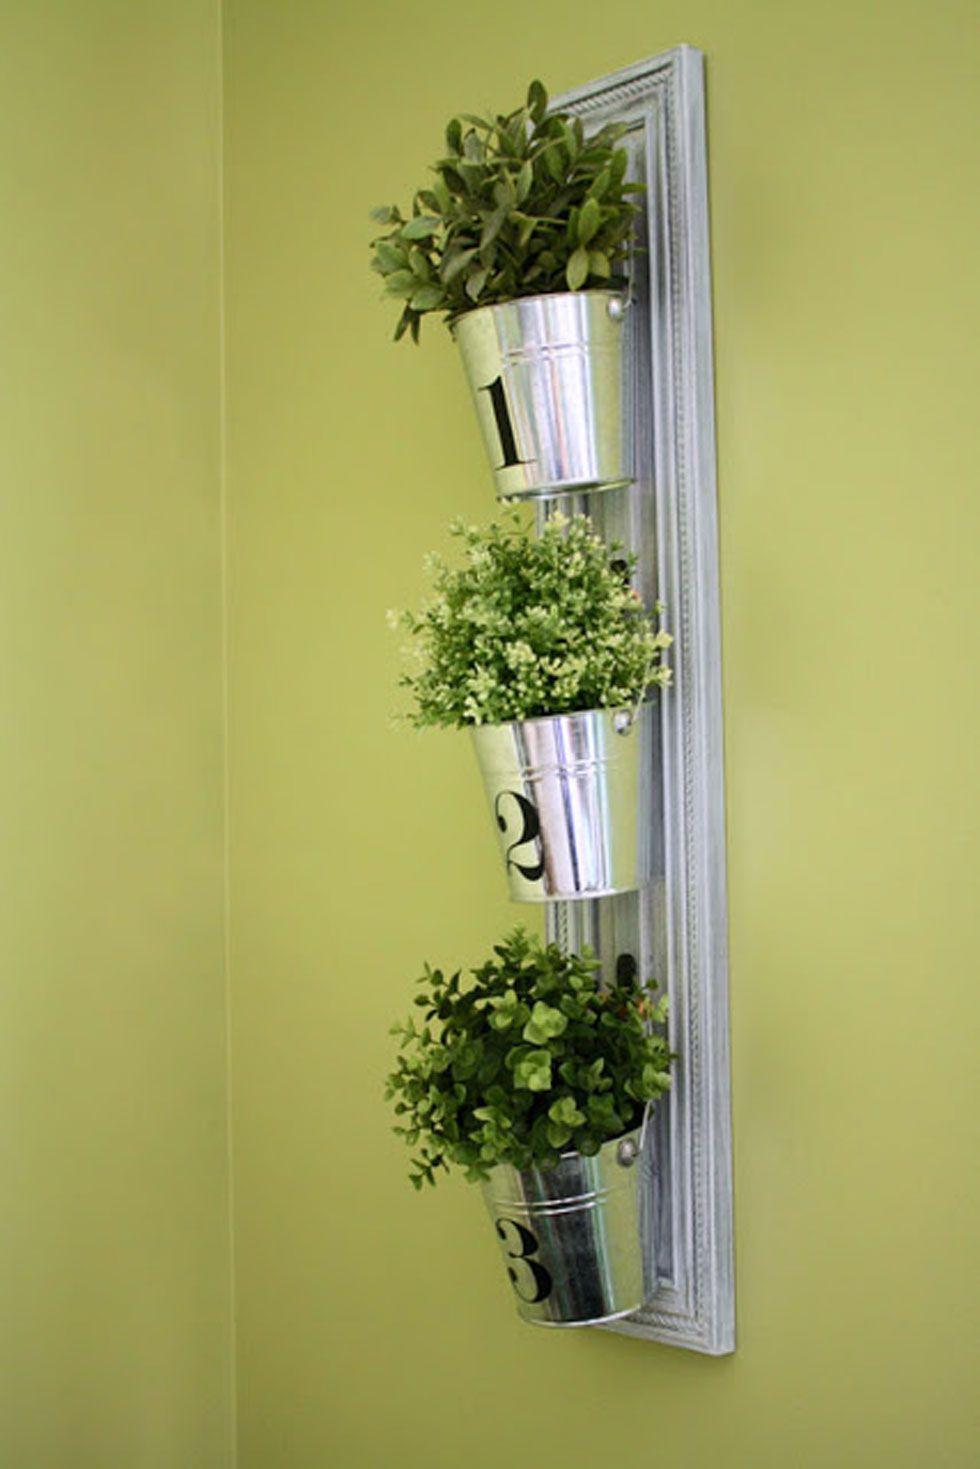 26 Creative Ways to Plant a Vertical Garden - How To Make a Vertical ...